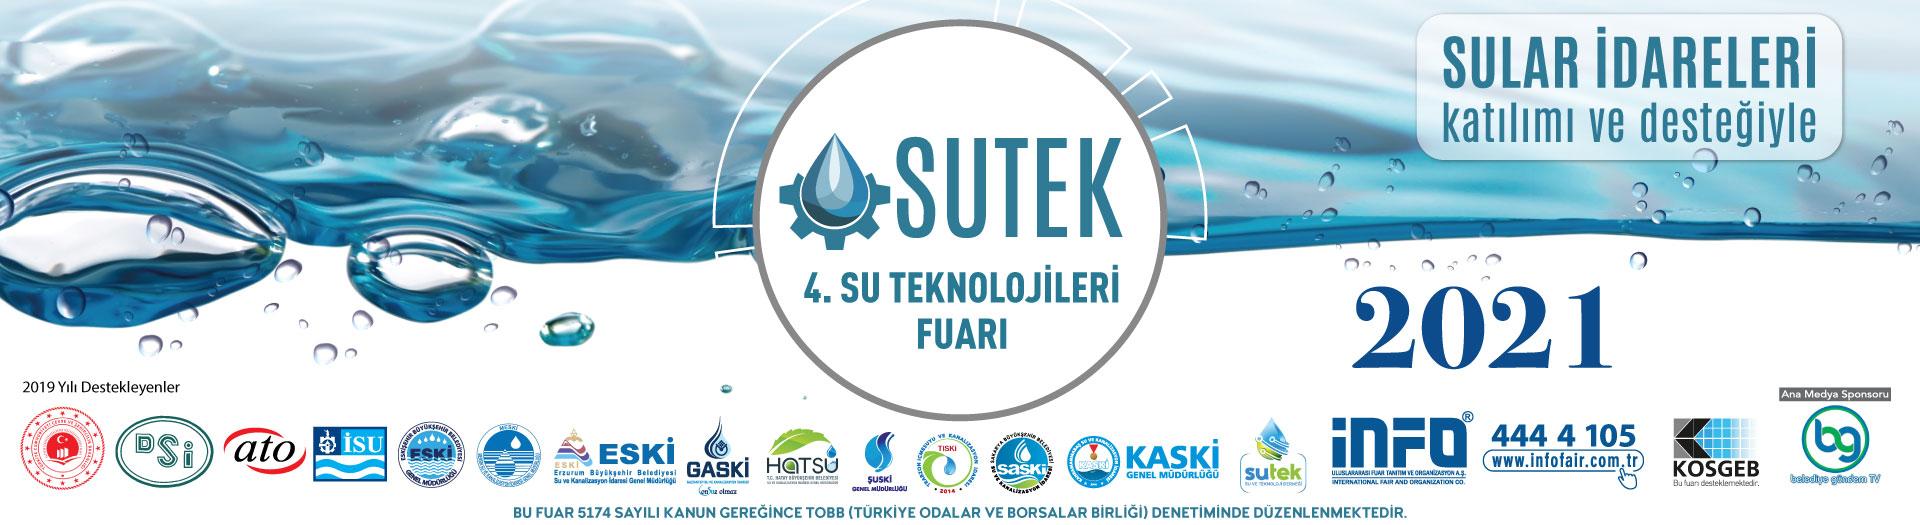 SUTEK 4. Su Teknolojileri Fuarı 2021